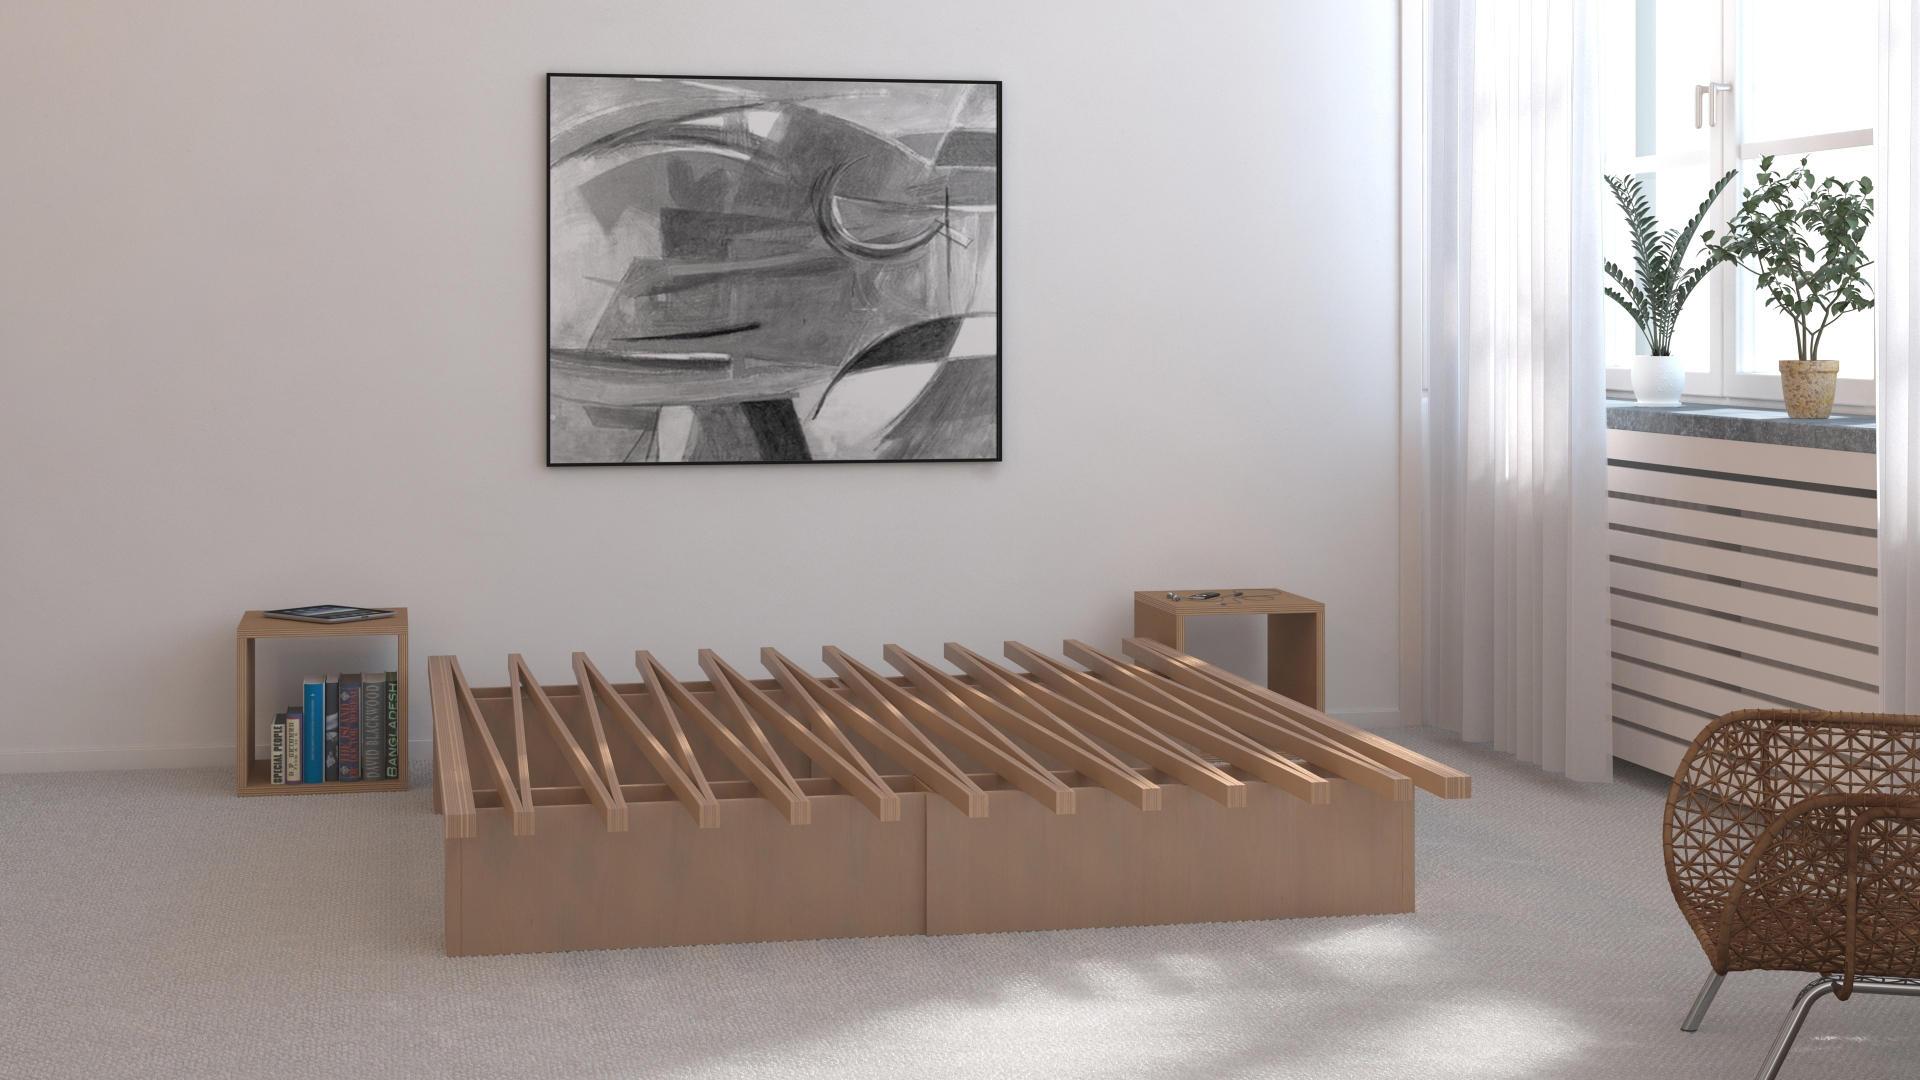 Full Size of Tojo V Bett Bettgestell (180 X 190 Cm) V Bett Erfahrung System Gebraucht Erfahrungsbericht Test Kaufen Bewertung Erfahrungen Lattenroste Bettgestelle Von Mbel Bett Tojo V Bett